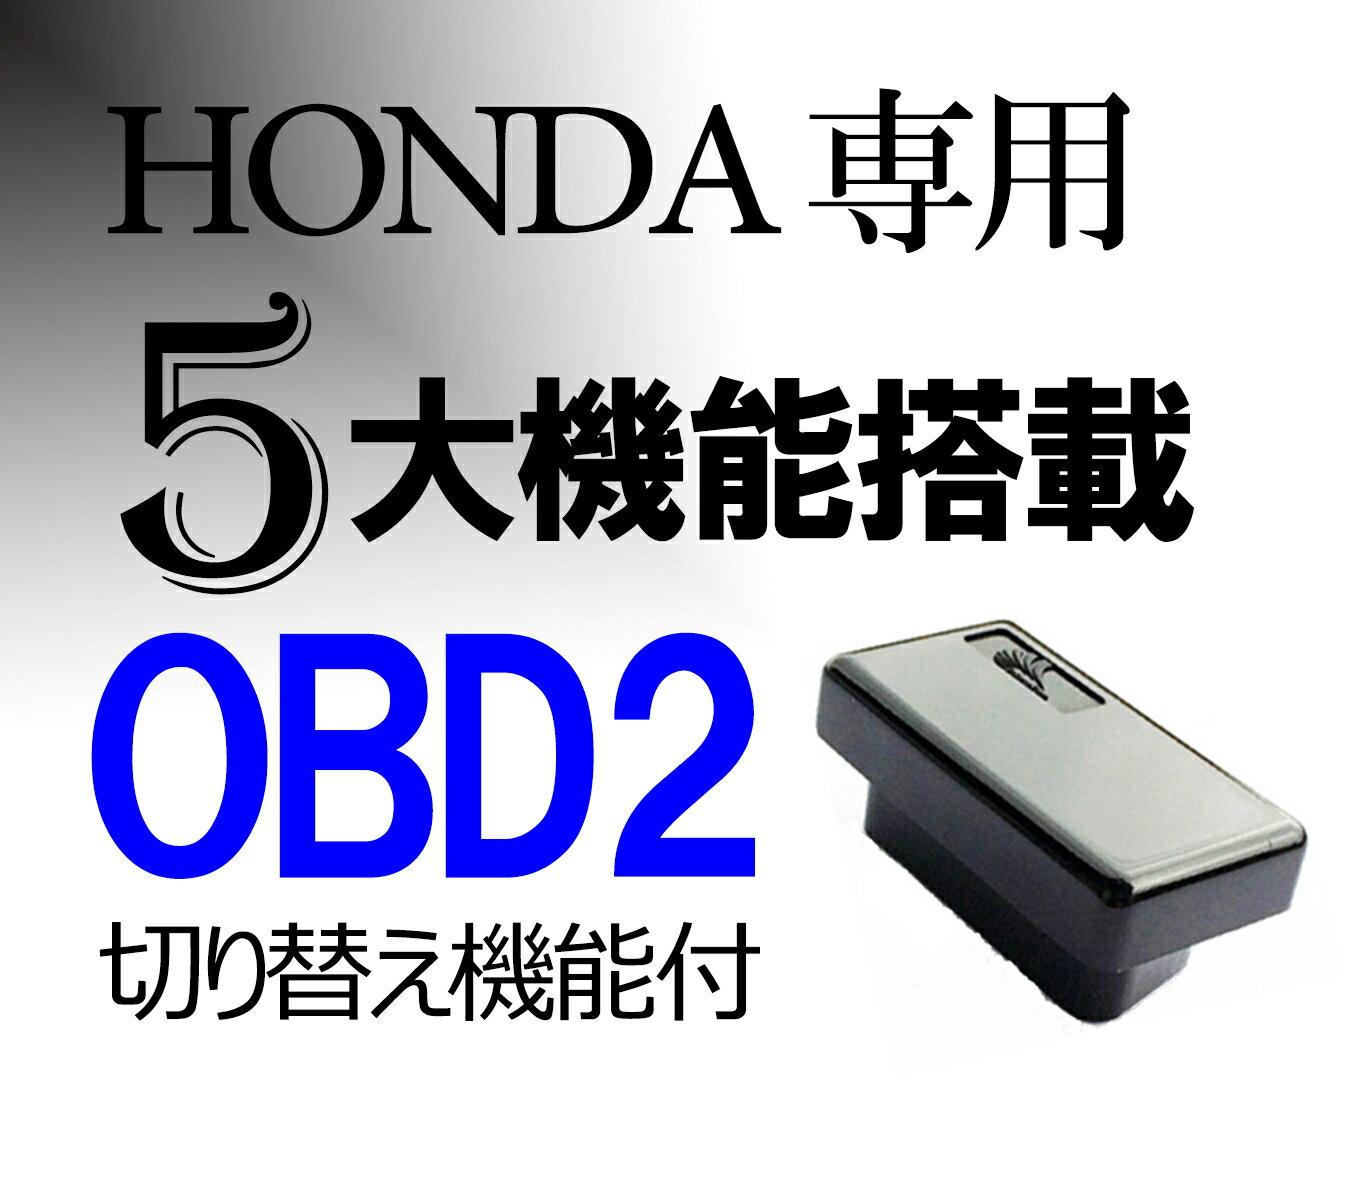 OBD2 車速連動ドアロック パーキングでロック解除 ハザード切り替え機能付き!ホンダフィットハイブリッド GP1 GP2 GP5 GP6 GP7 GP8 GE6 GE7 GE8 GE9 GK3 GK4 GK5 GK6 RS GG7 ZE2 CR-Z GB3 RK5 RP1 RP3 1.3S 1.3G,S660 CVT